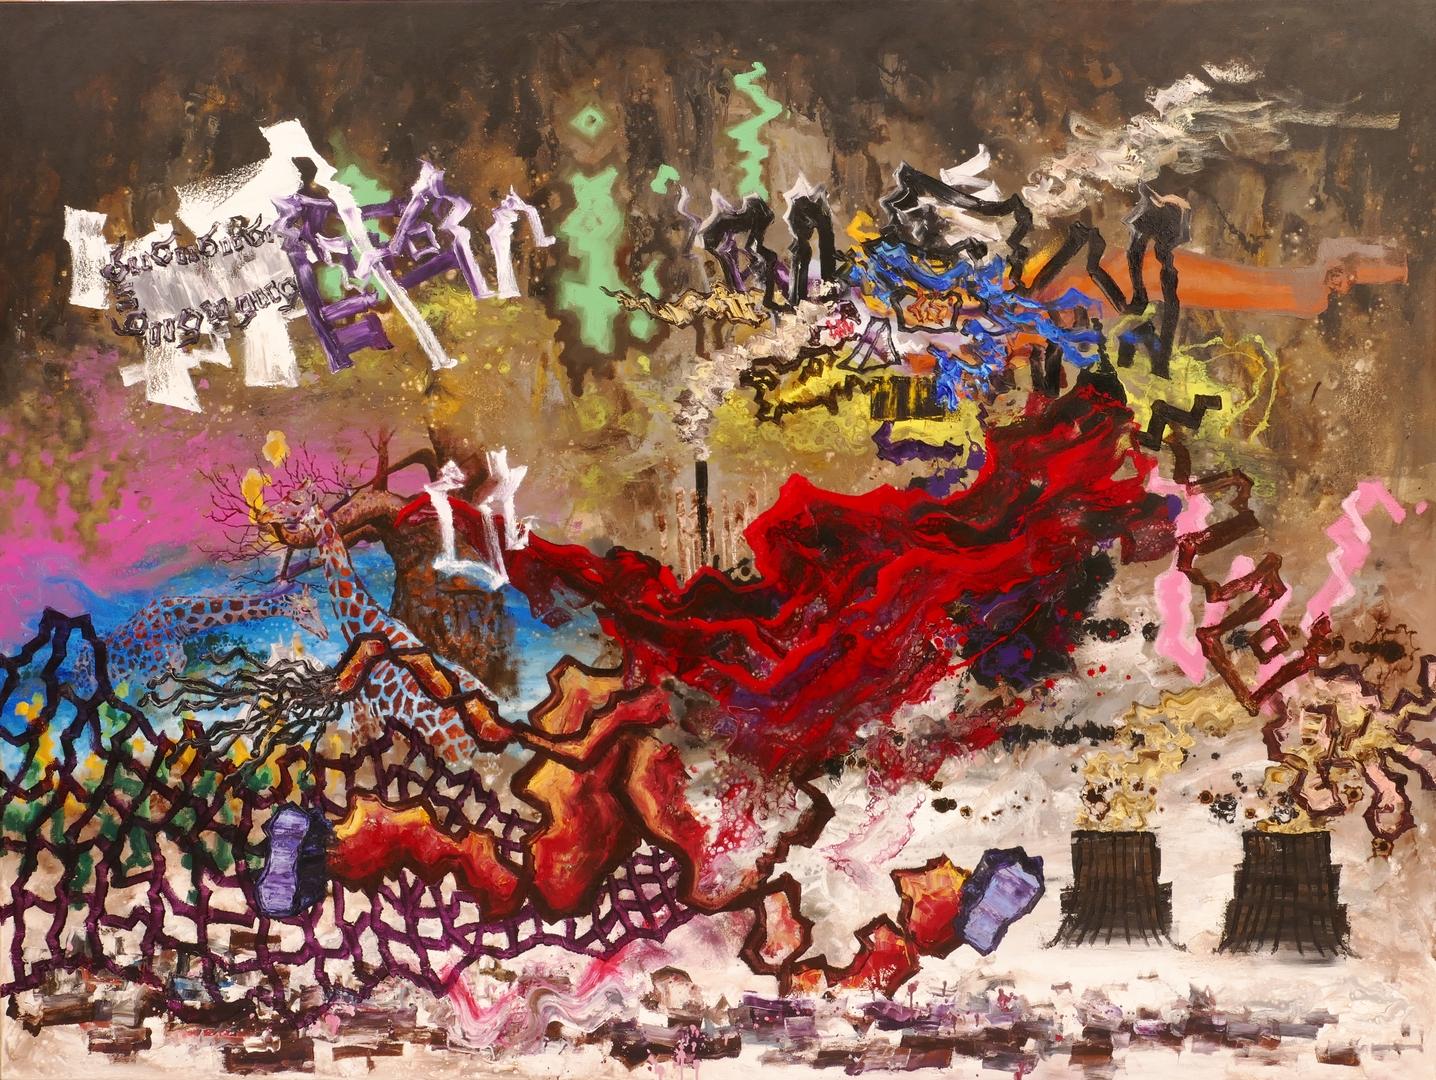 B, Unaufhaltsame Zerstörung, 150x200cm, Öl ,Acryl auf Leinwand, 2020